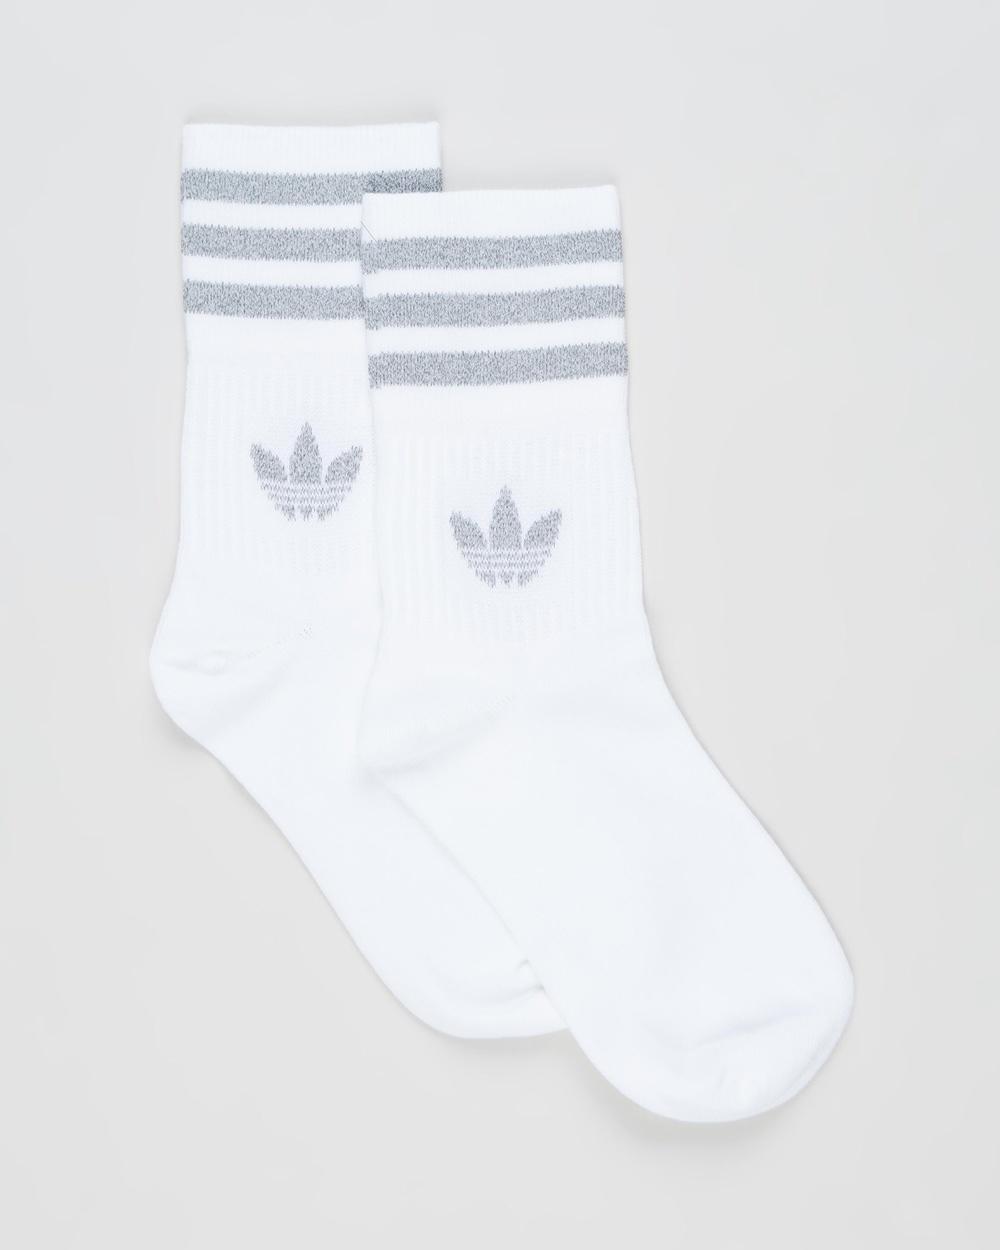 adidas Originals 2 Pack Crew Socks Unisex White & Reflective Silver 2-Pack